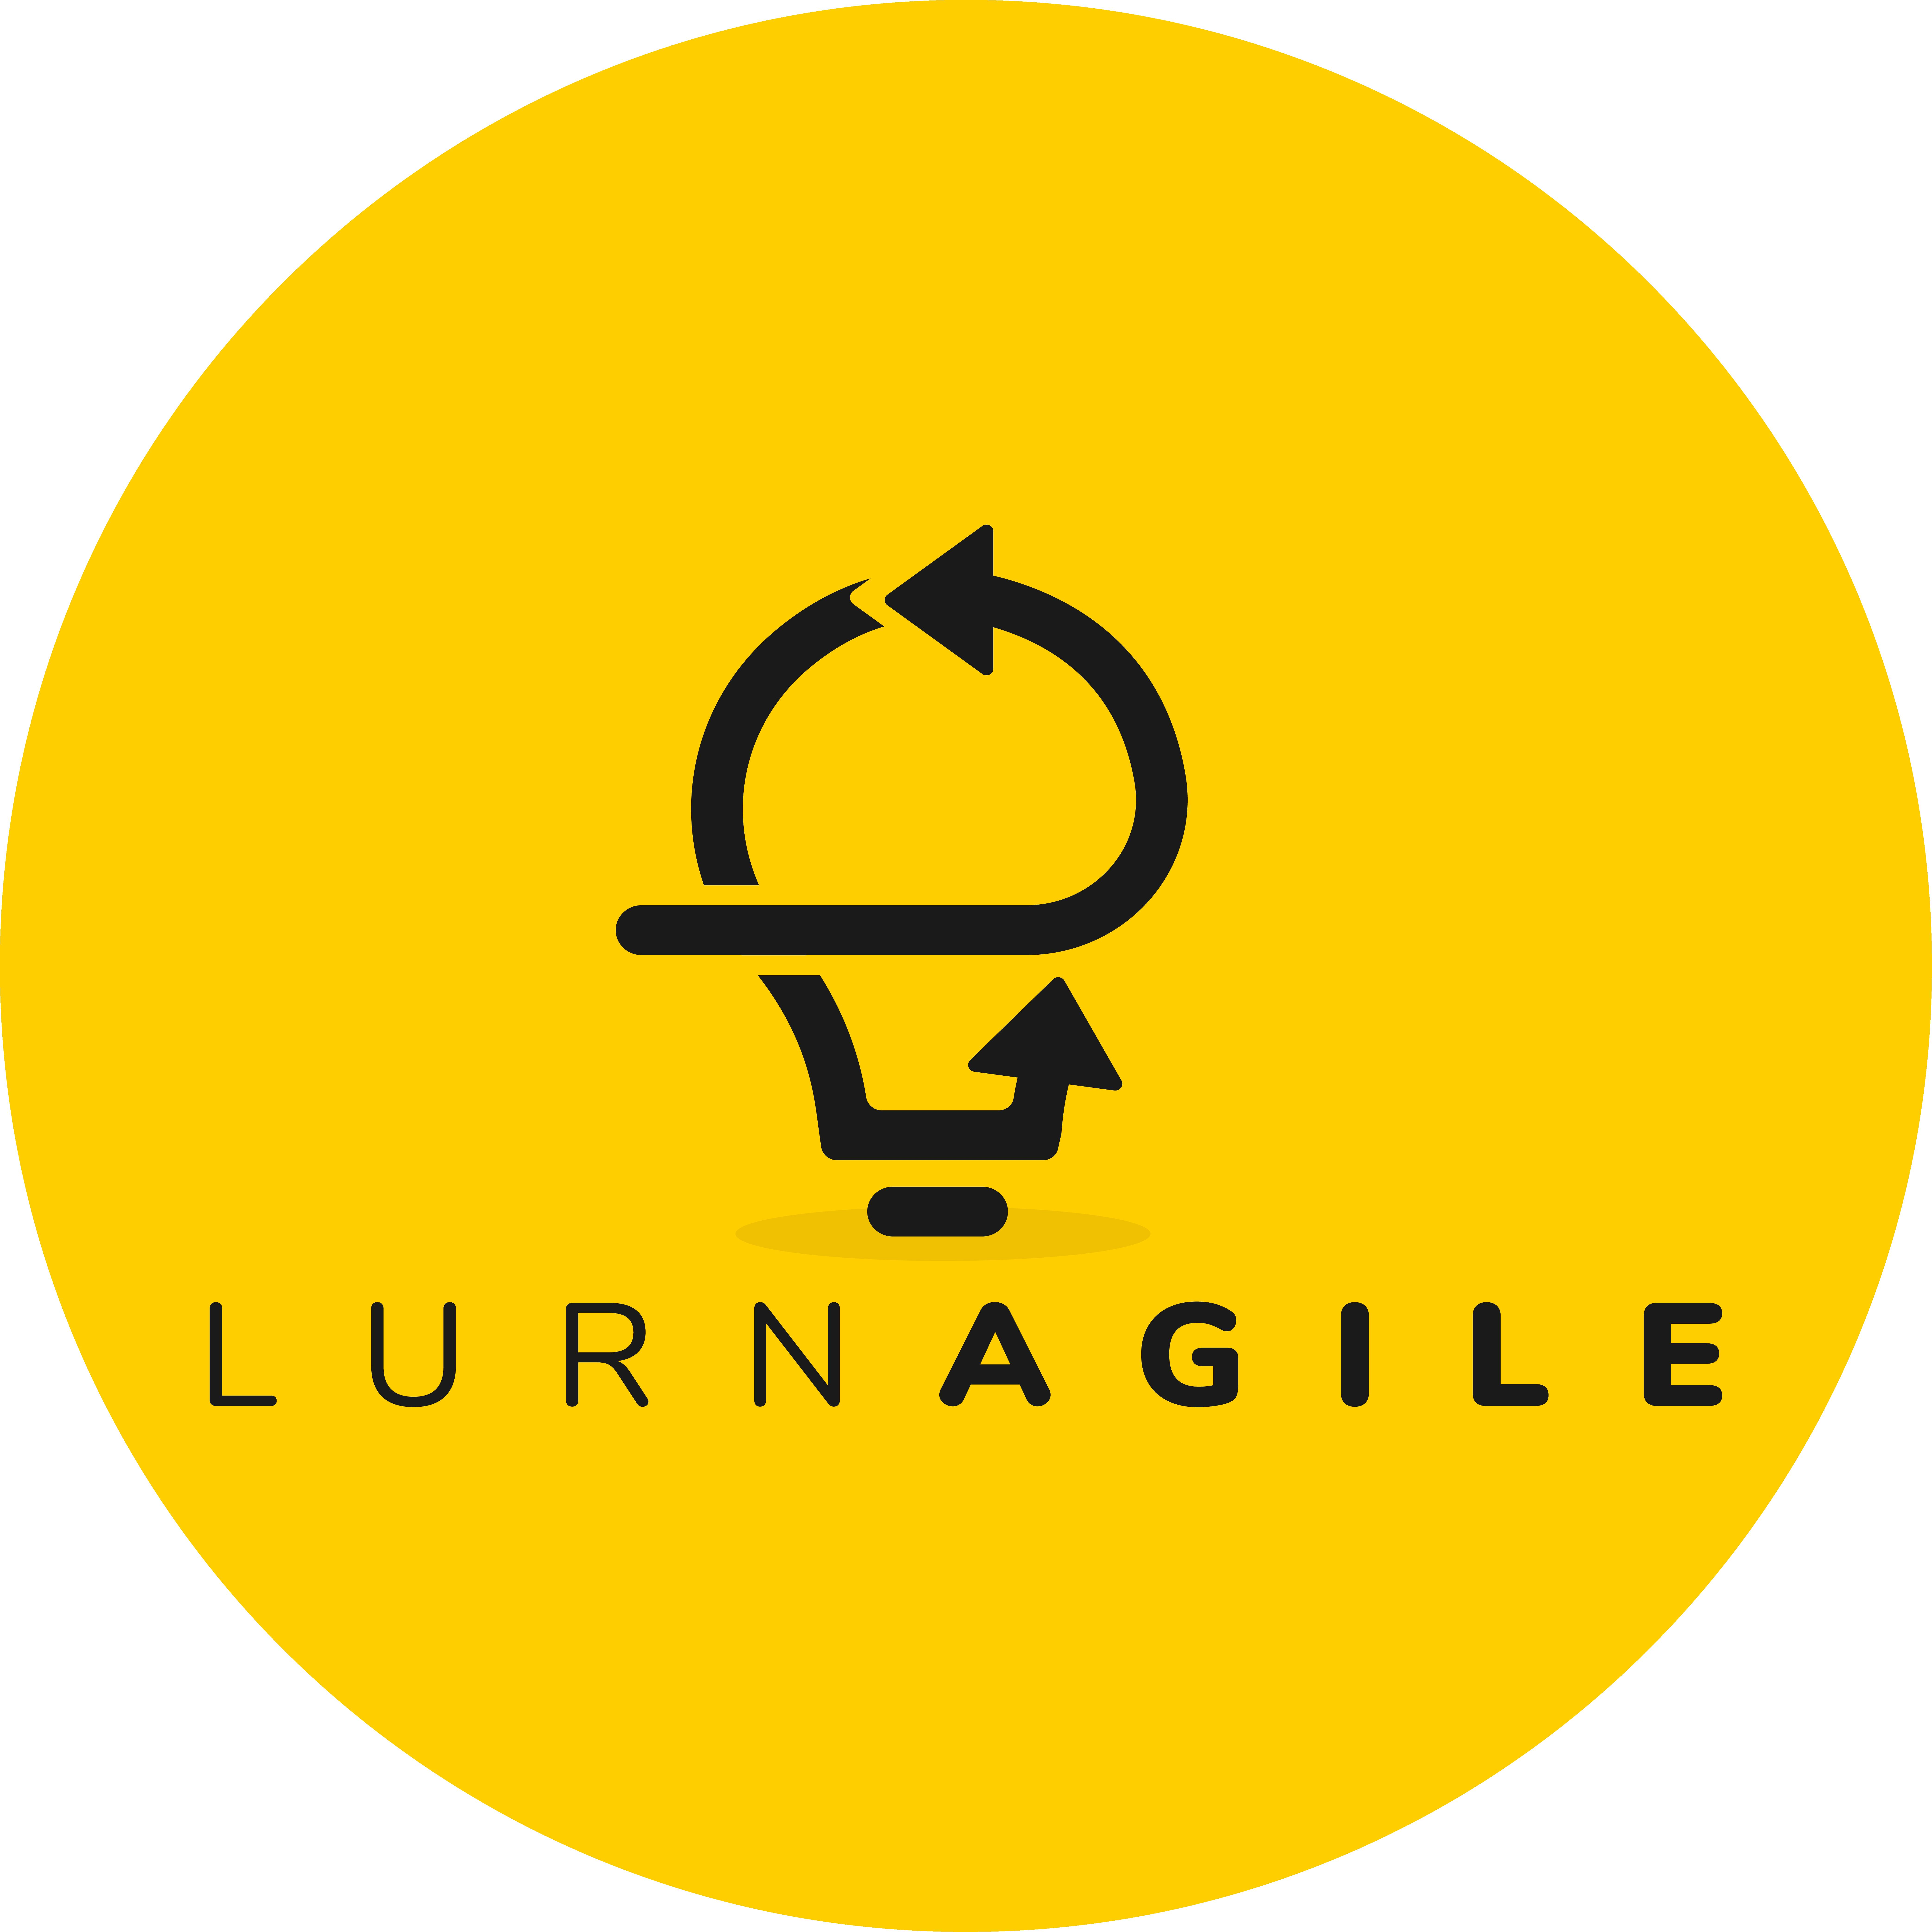 LurnAgile Joins the Scaled Agile Partner Network